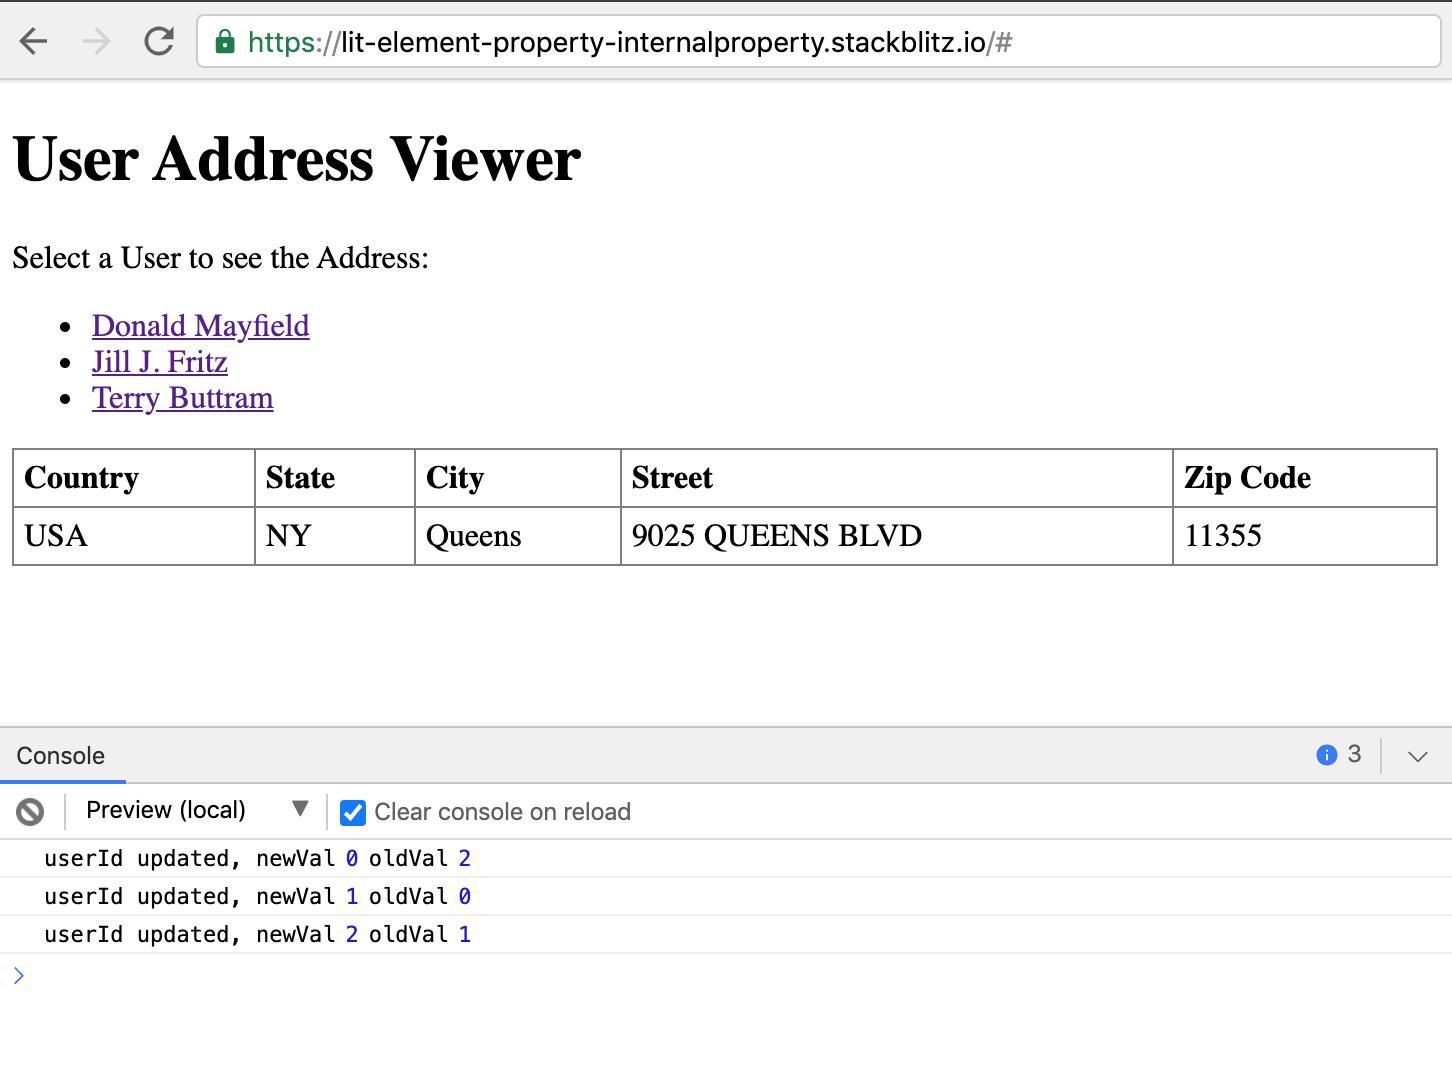 LitElement properties: @property vs @internalproperty